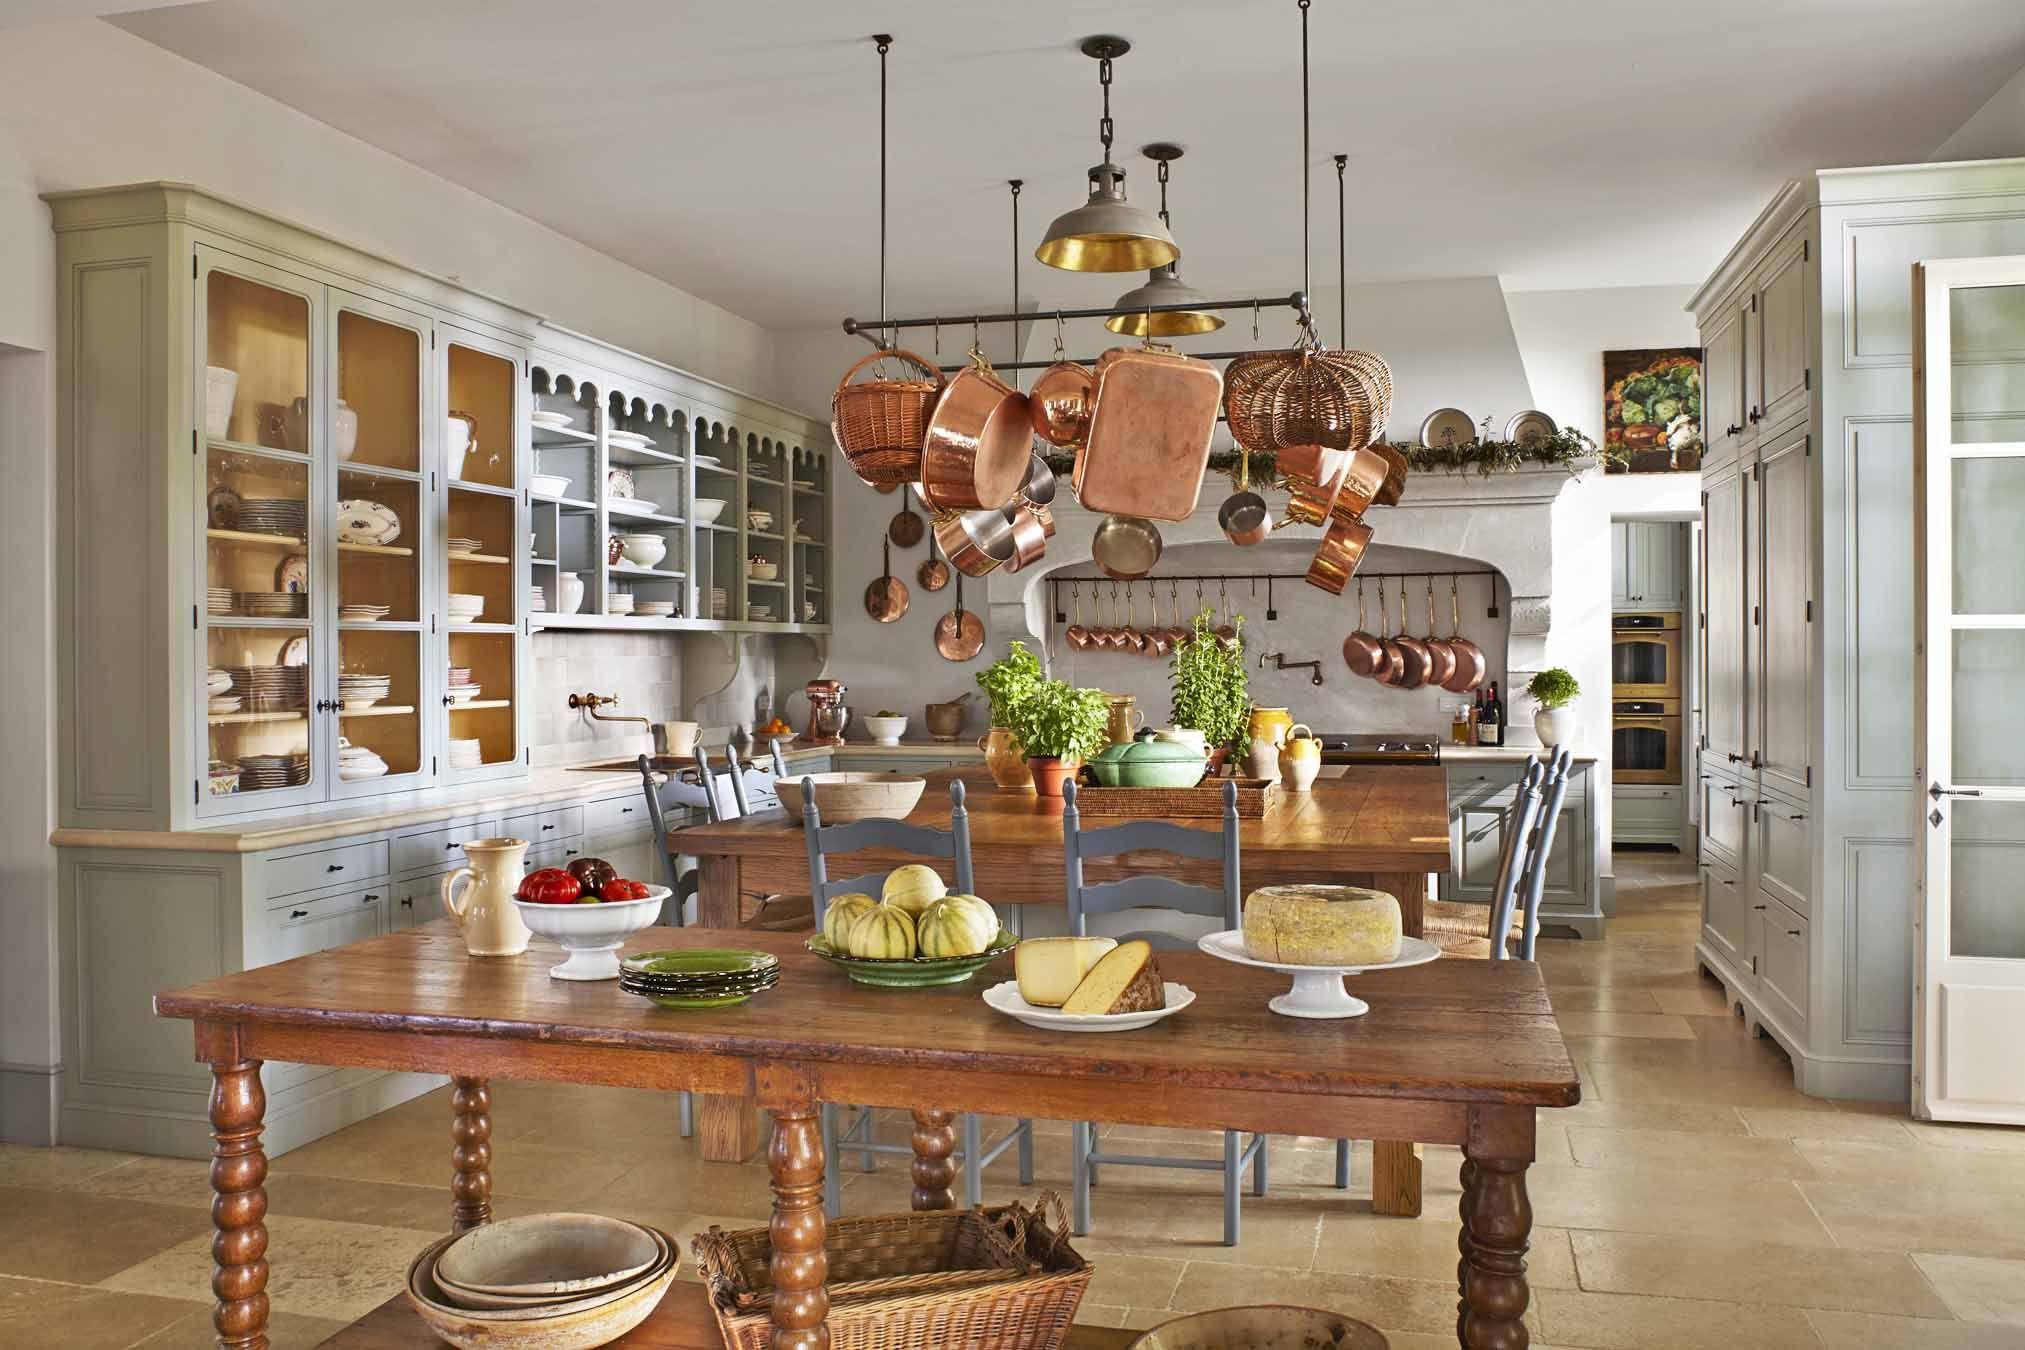 white kitchen bednar long provence veranda